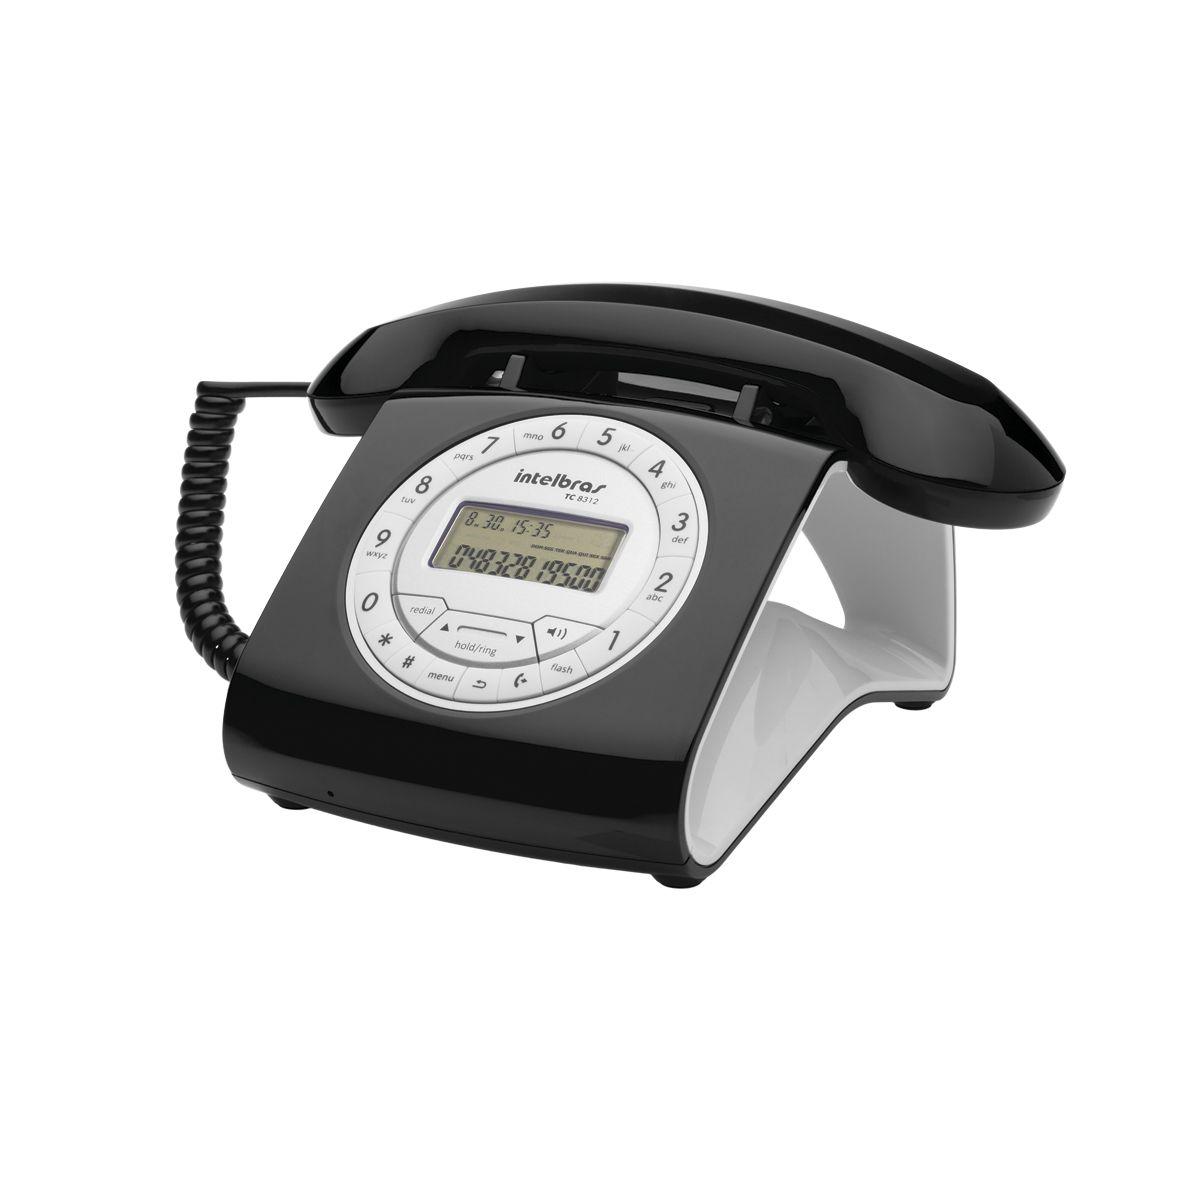 Telefone c/ Fio Retrô TC-8312 - Intelbras